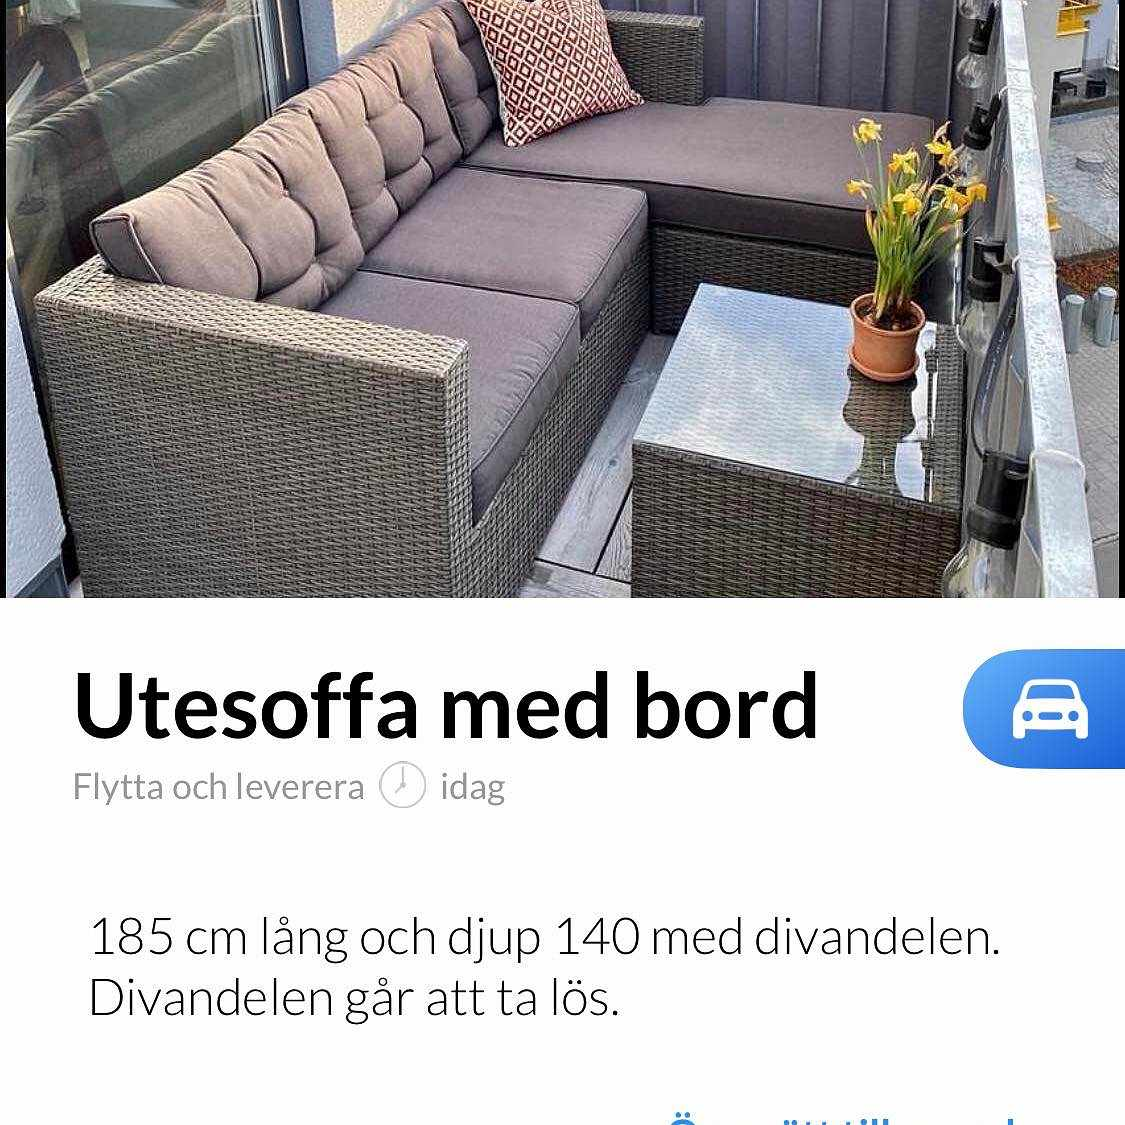 image of Hämta en utemöbel -